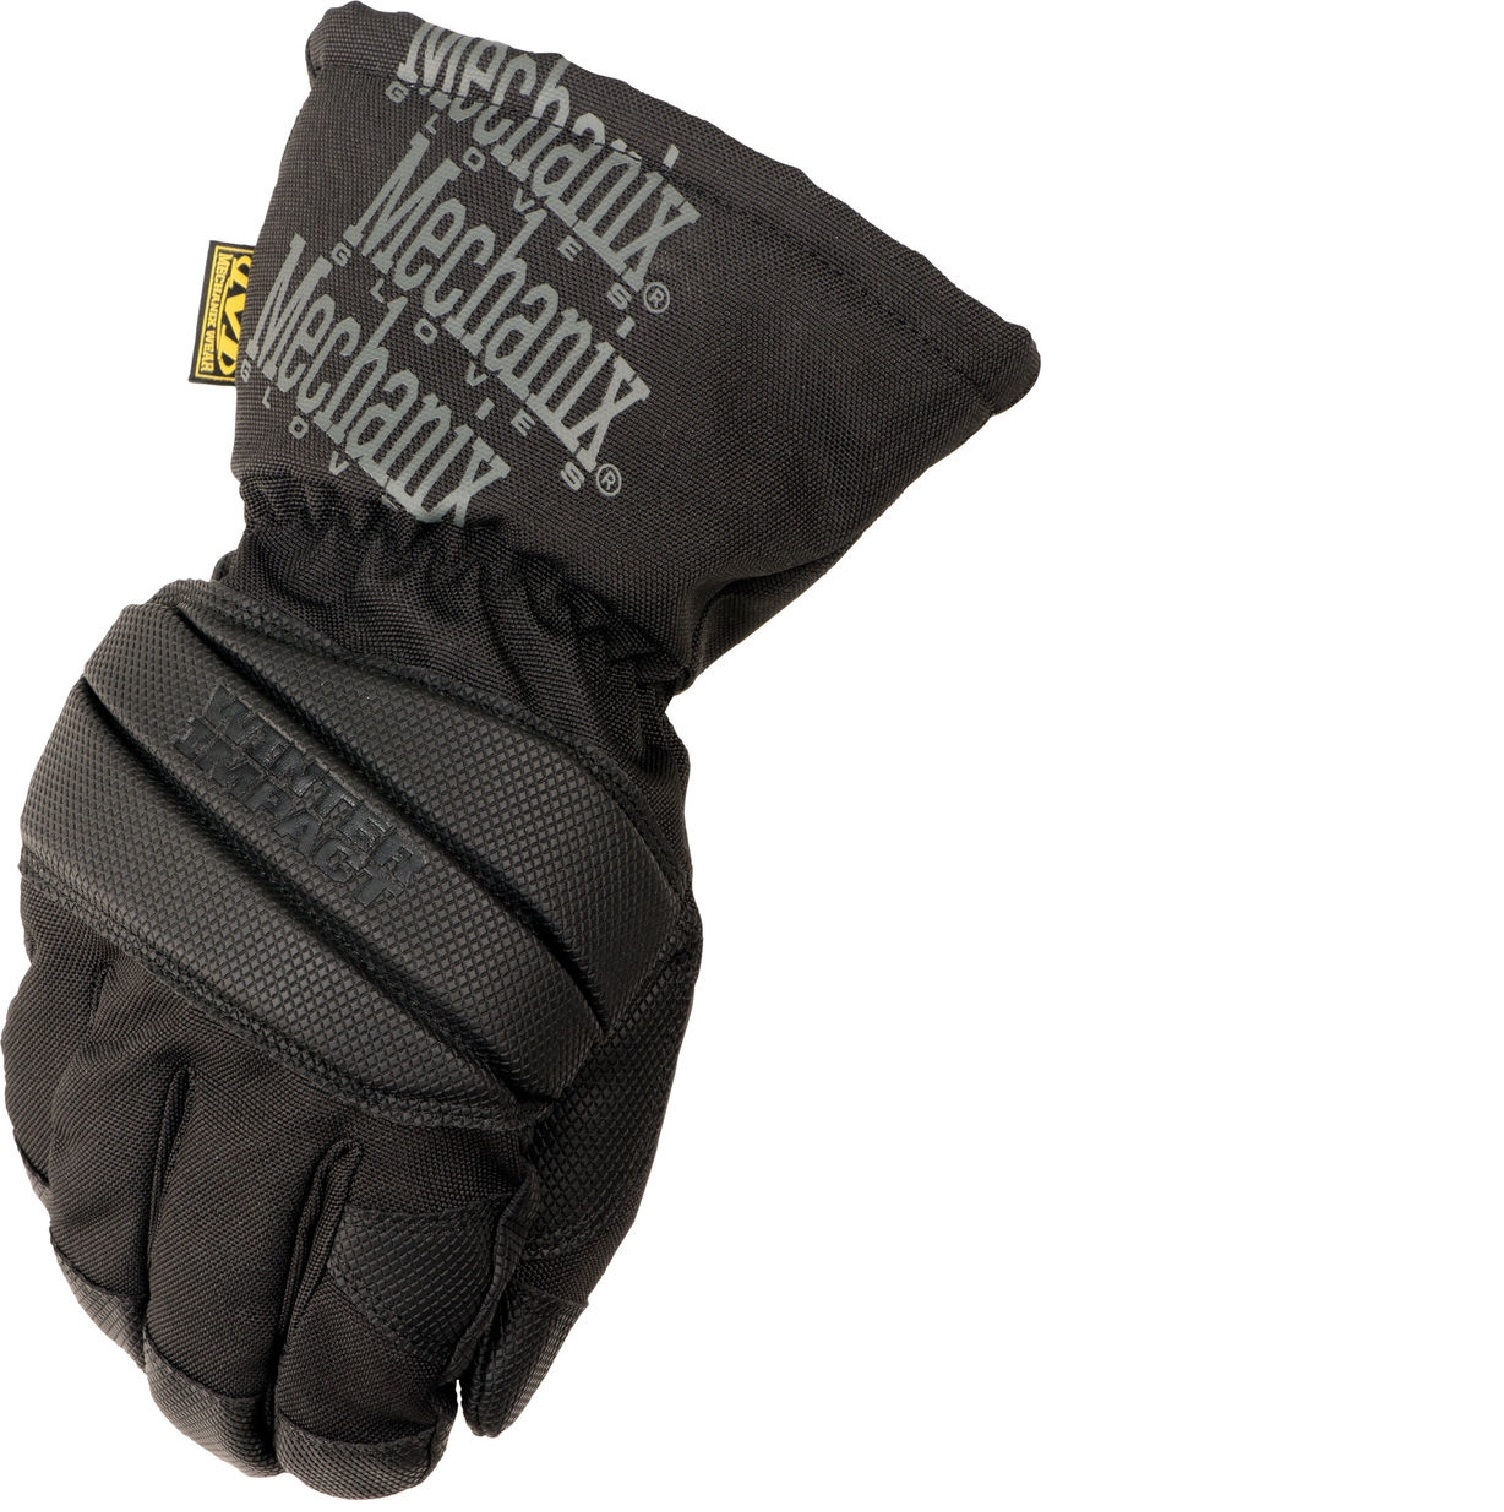 Mechanix Winter Impact Glove Black Medium